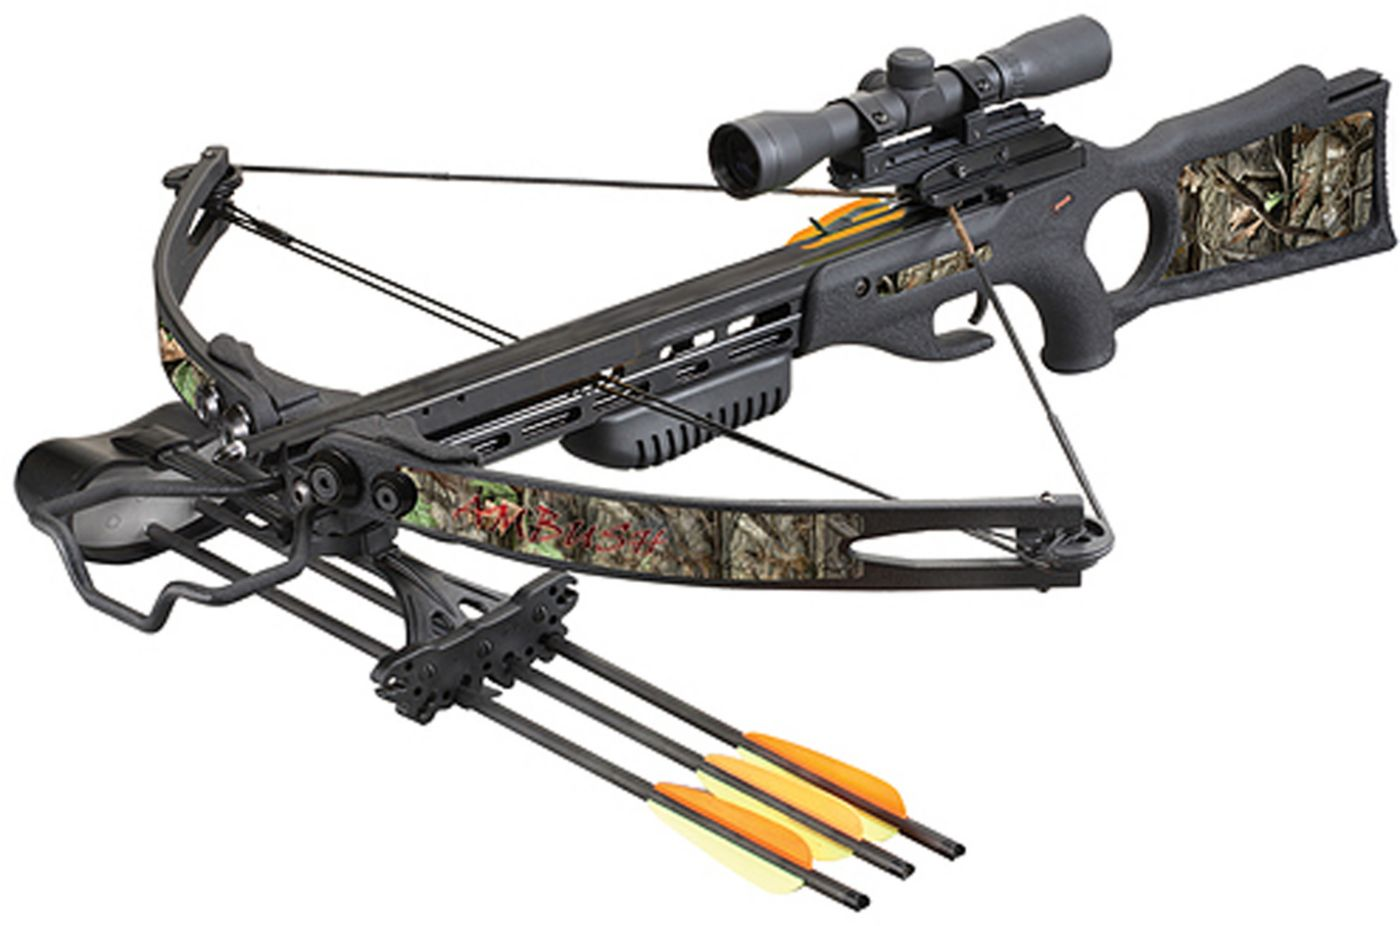 SA Sports Ambush Crossbow Package